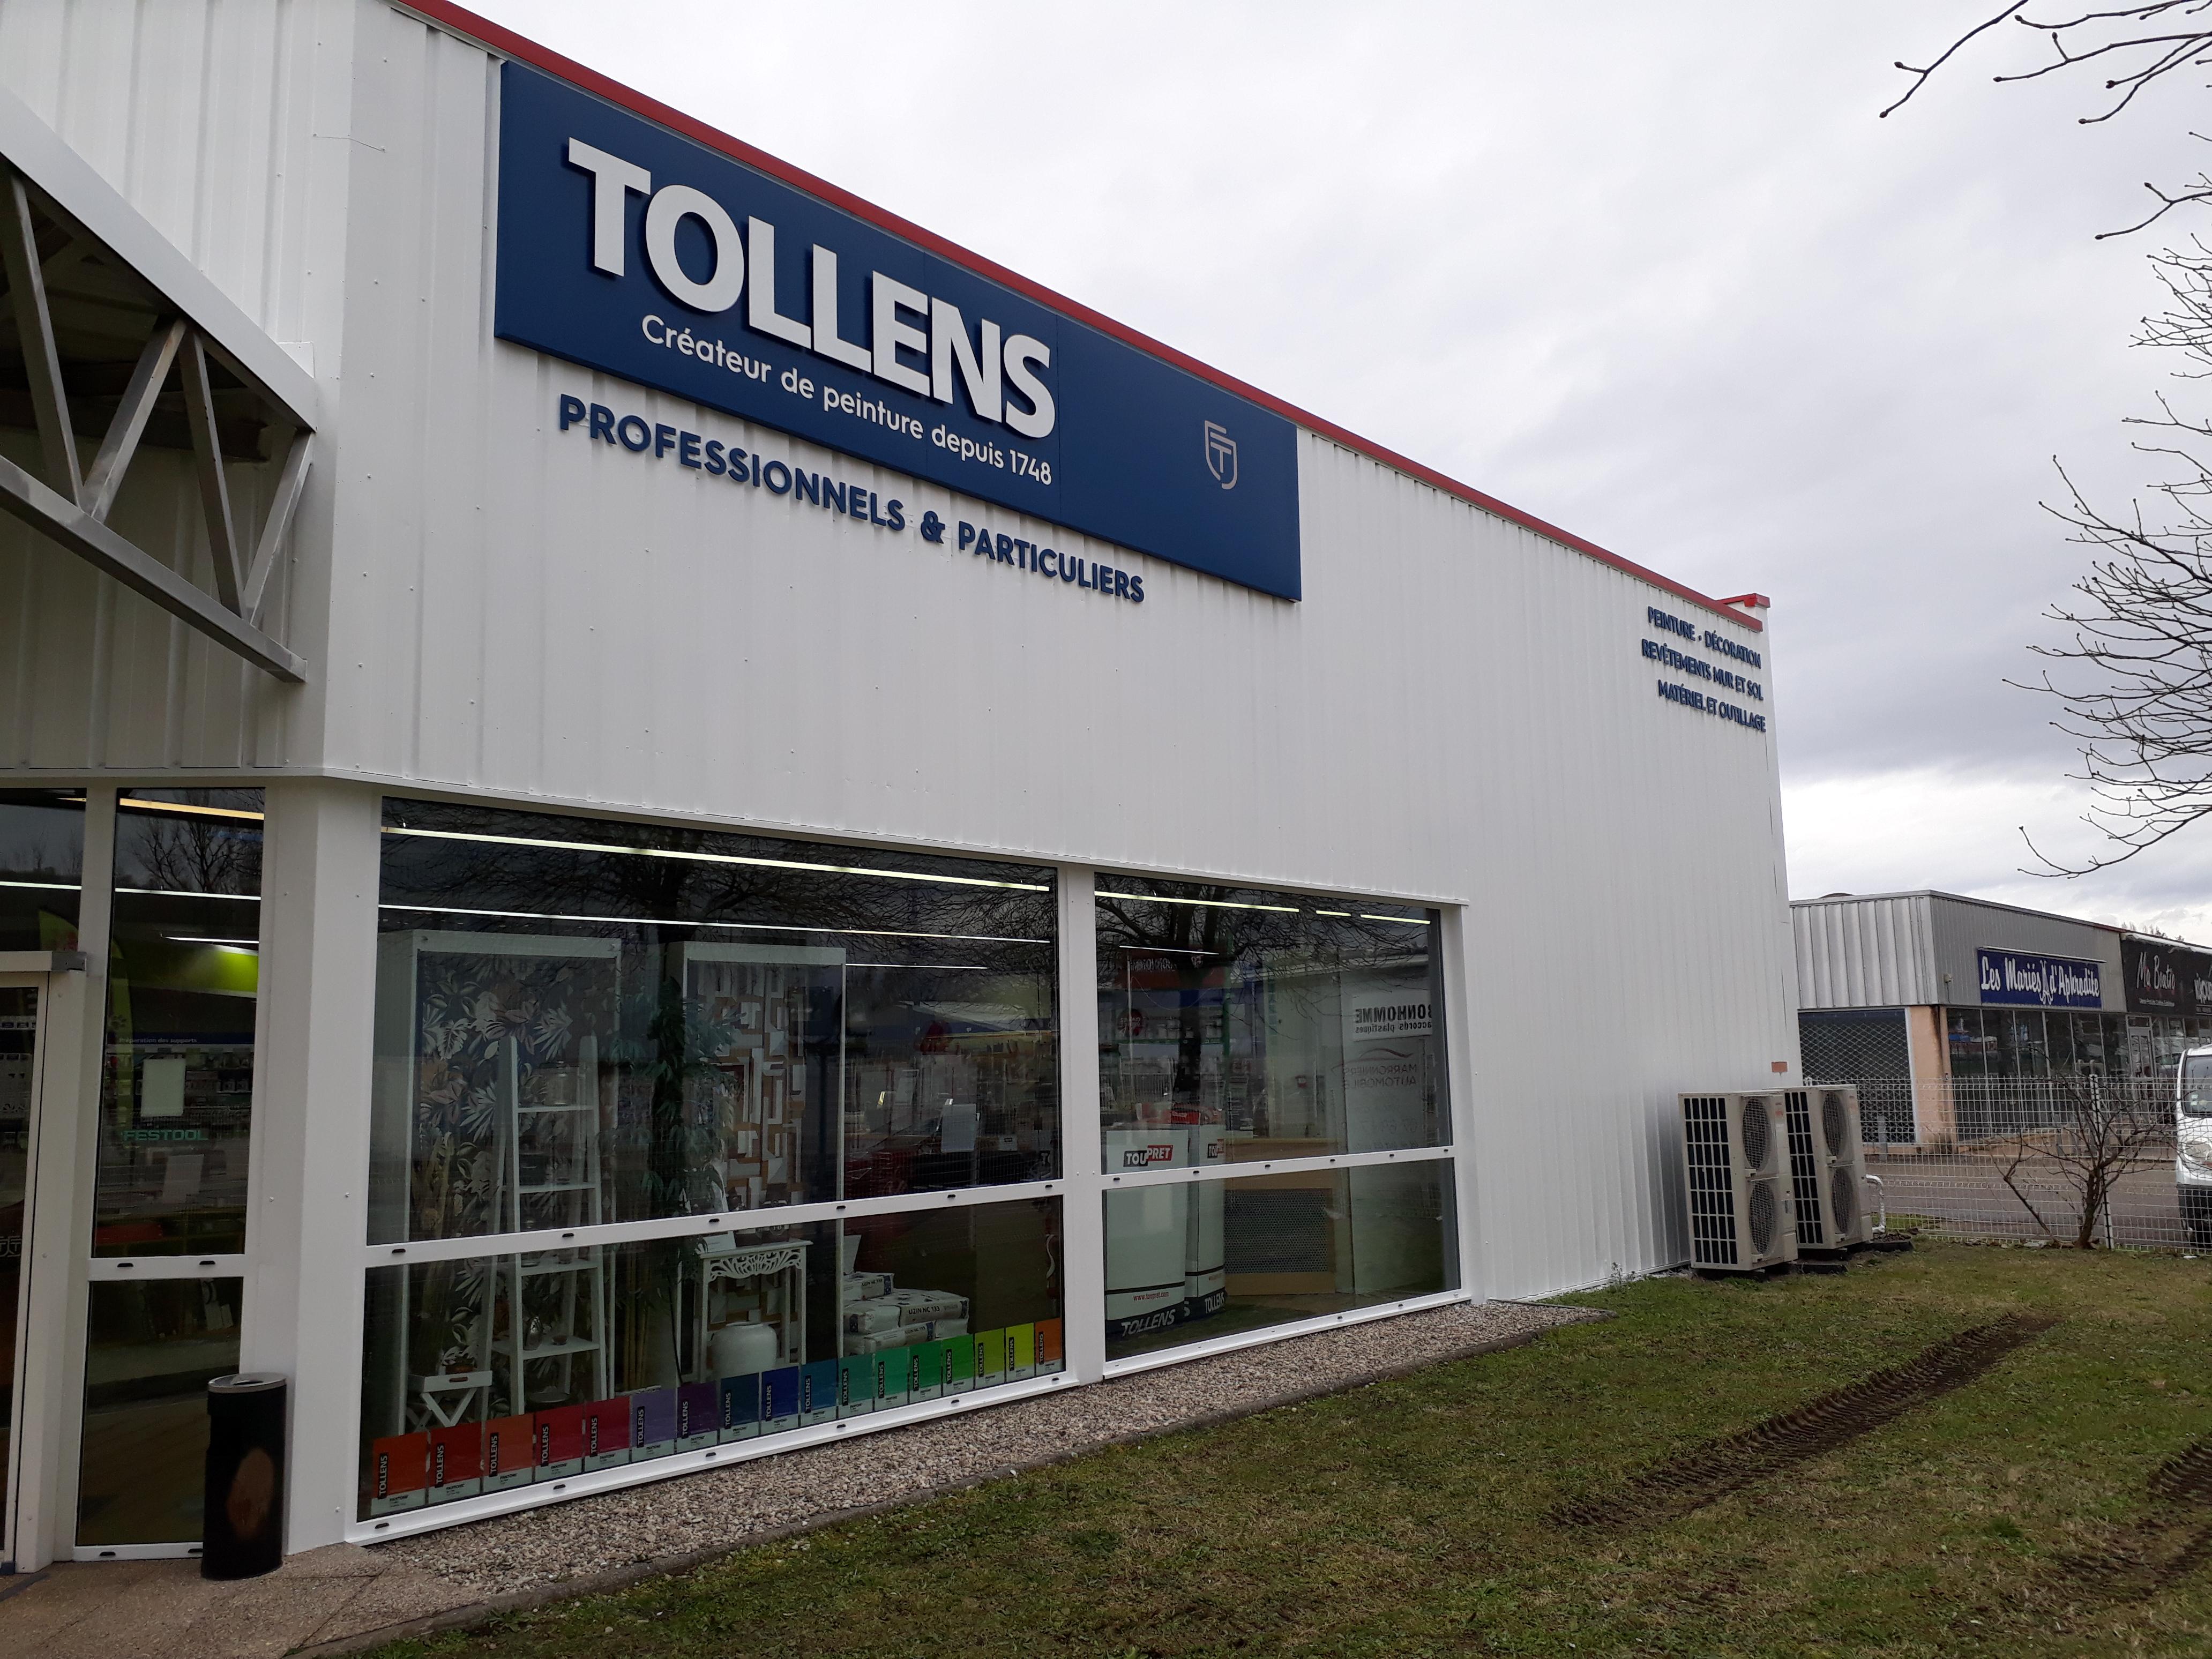 Tollens Bourgoin-Jallieu